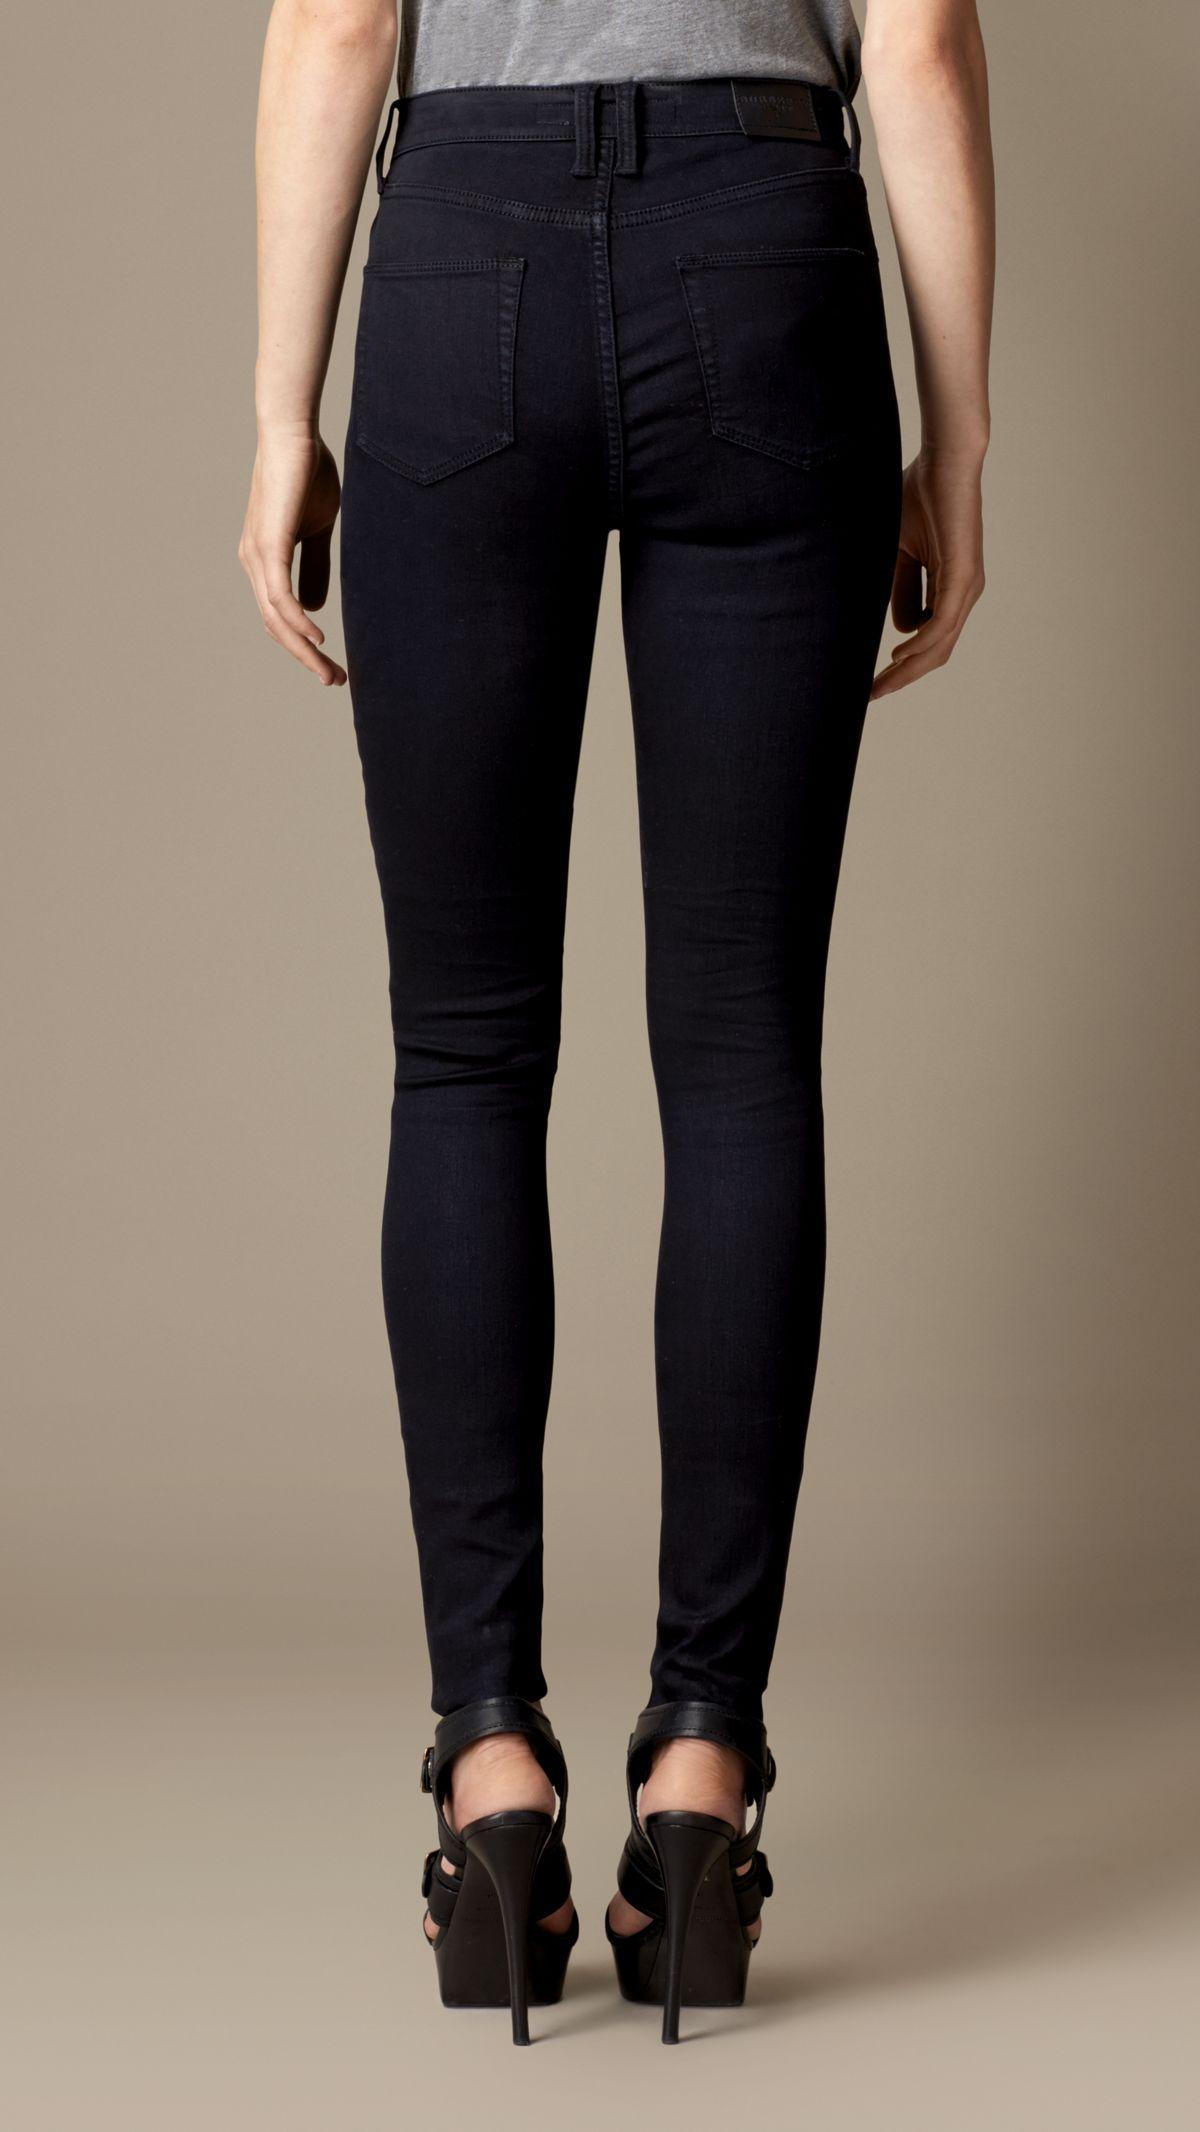 Burberry Denim Skinny Fit High-rise Deep Indigo Jeans in Dark Indigo (Blue)